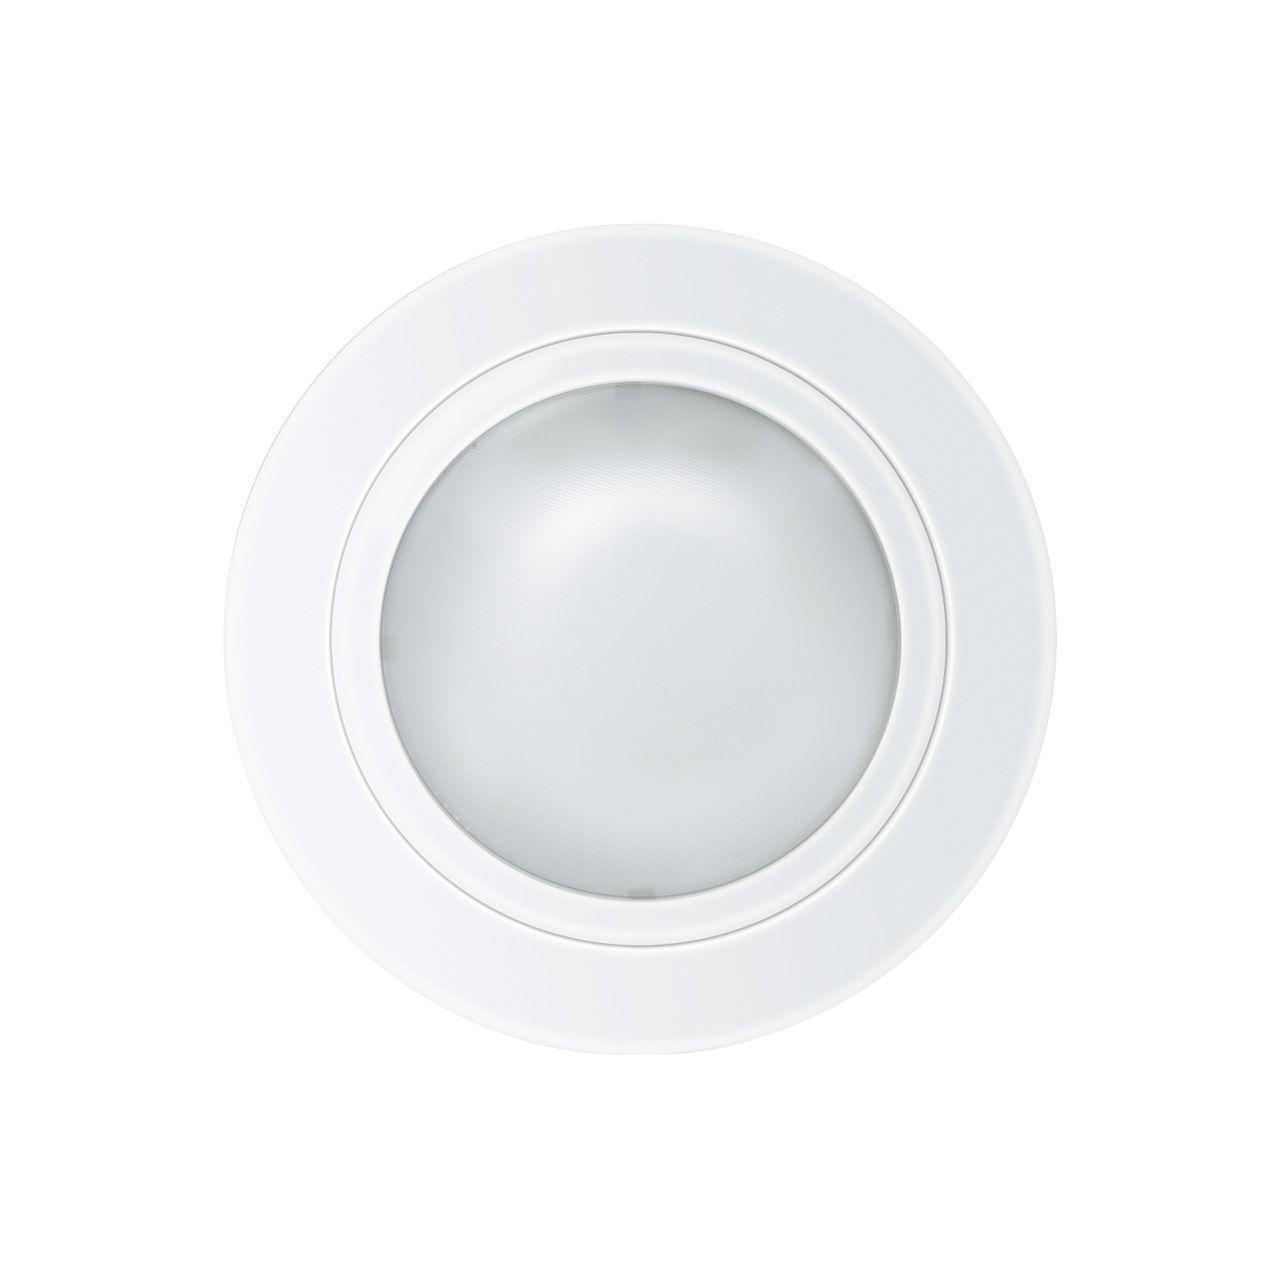 Luminária embutir redonda Ø160mm tampa com vidro fosco